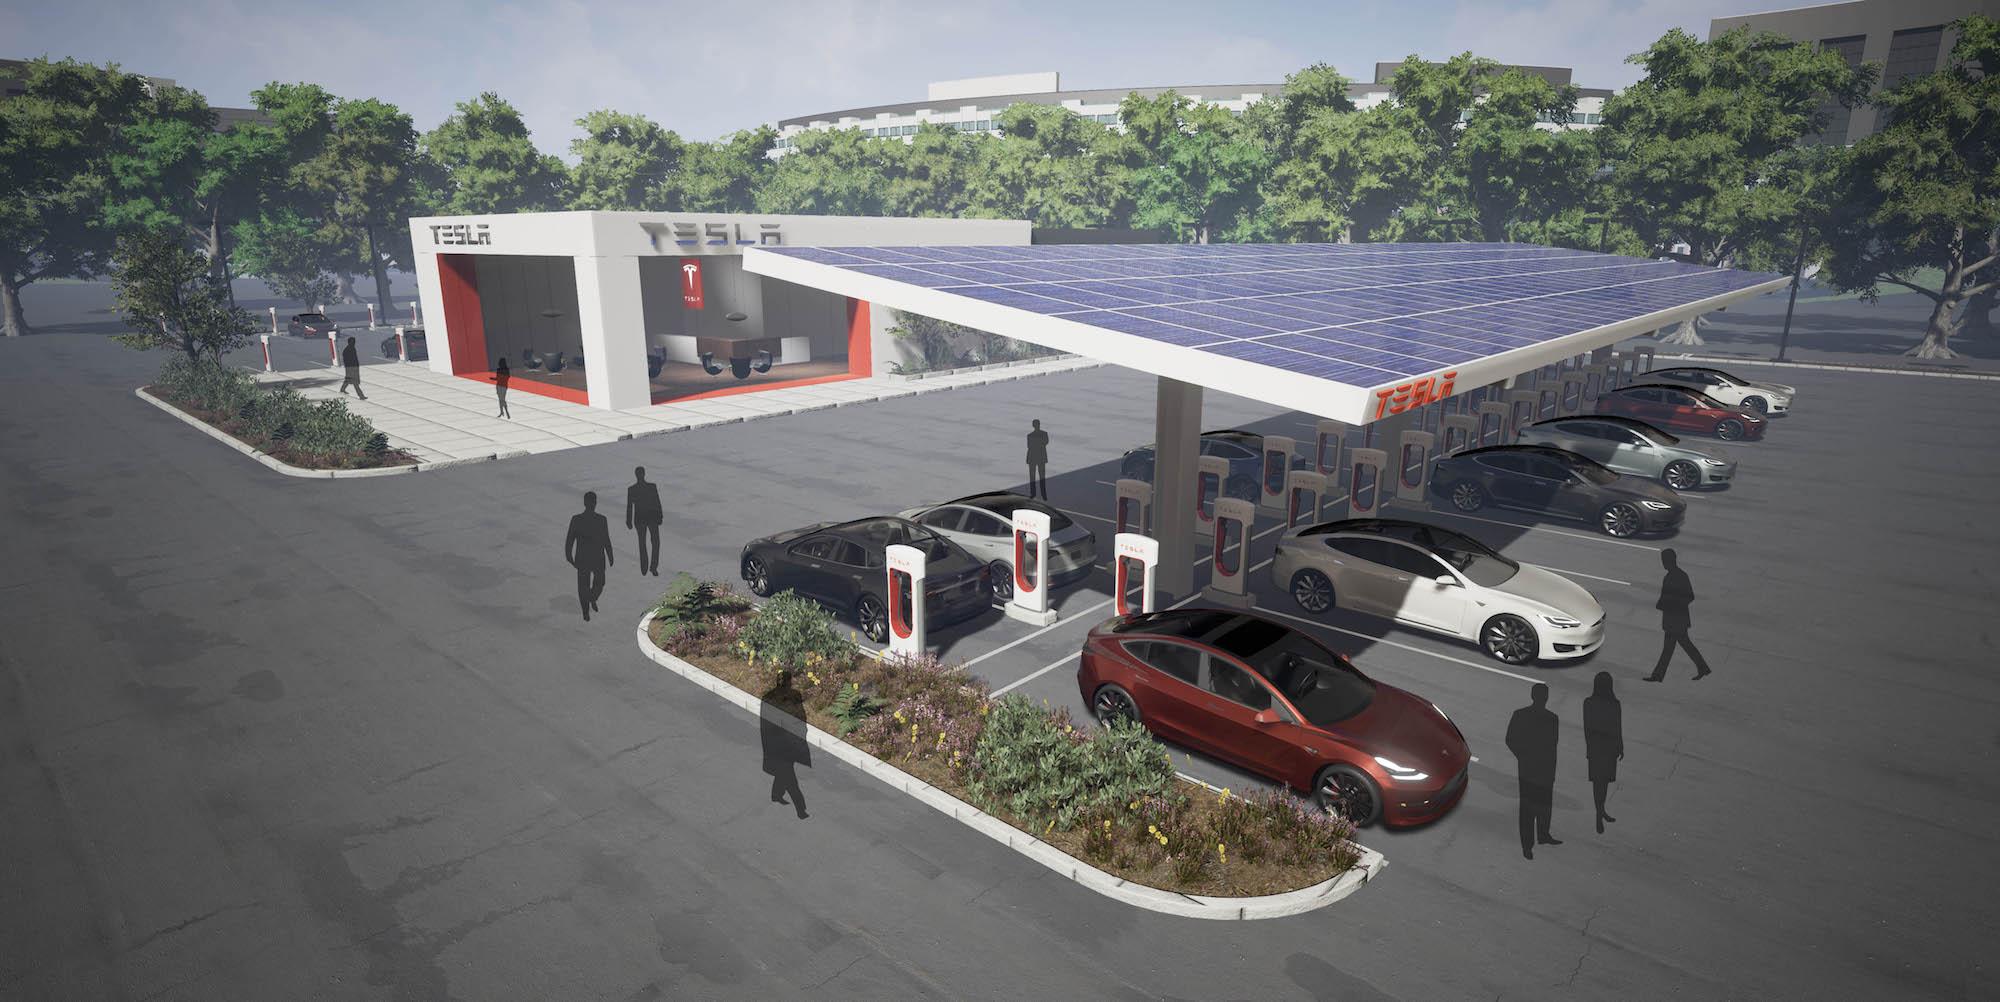 tesla-supercharger-solar-panel-canopy